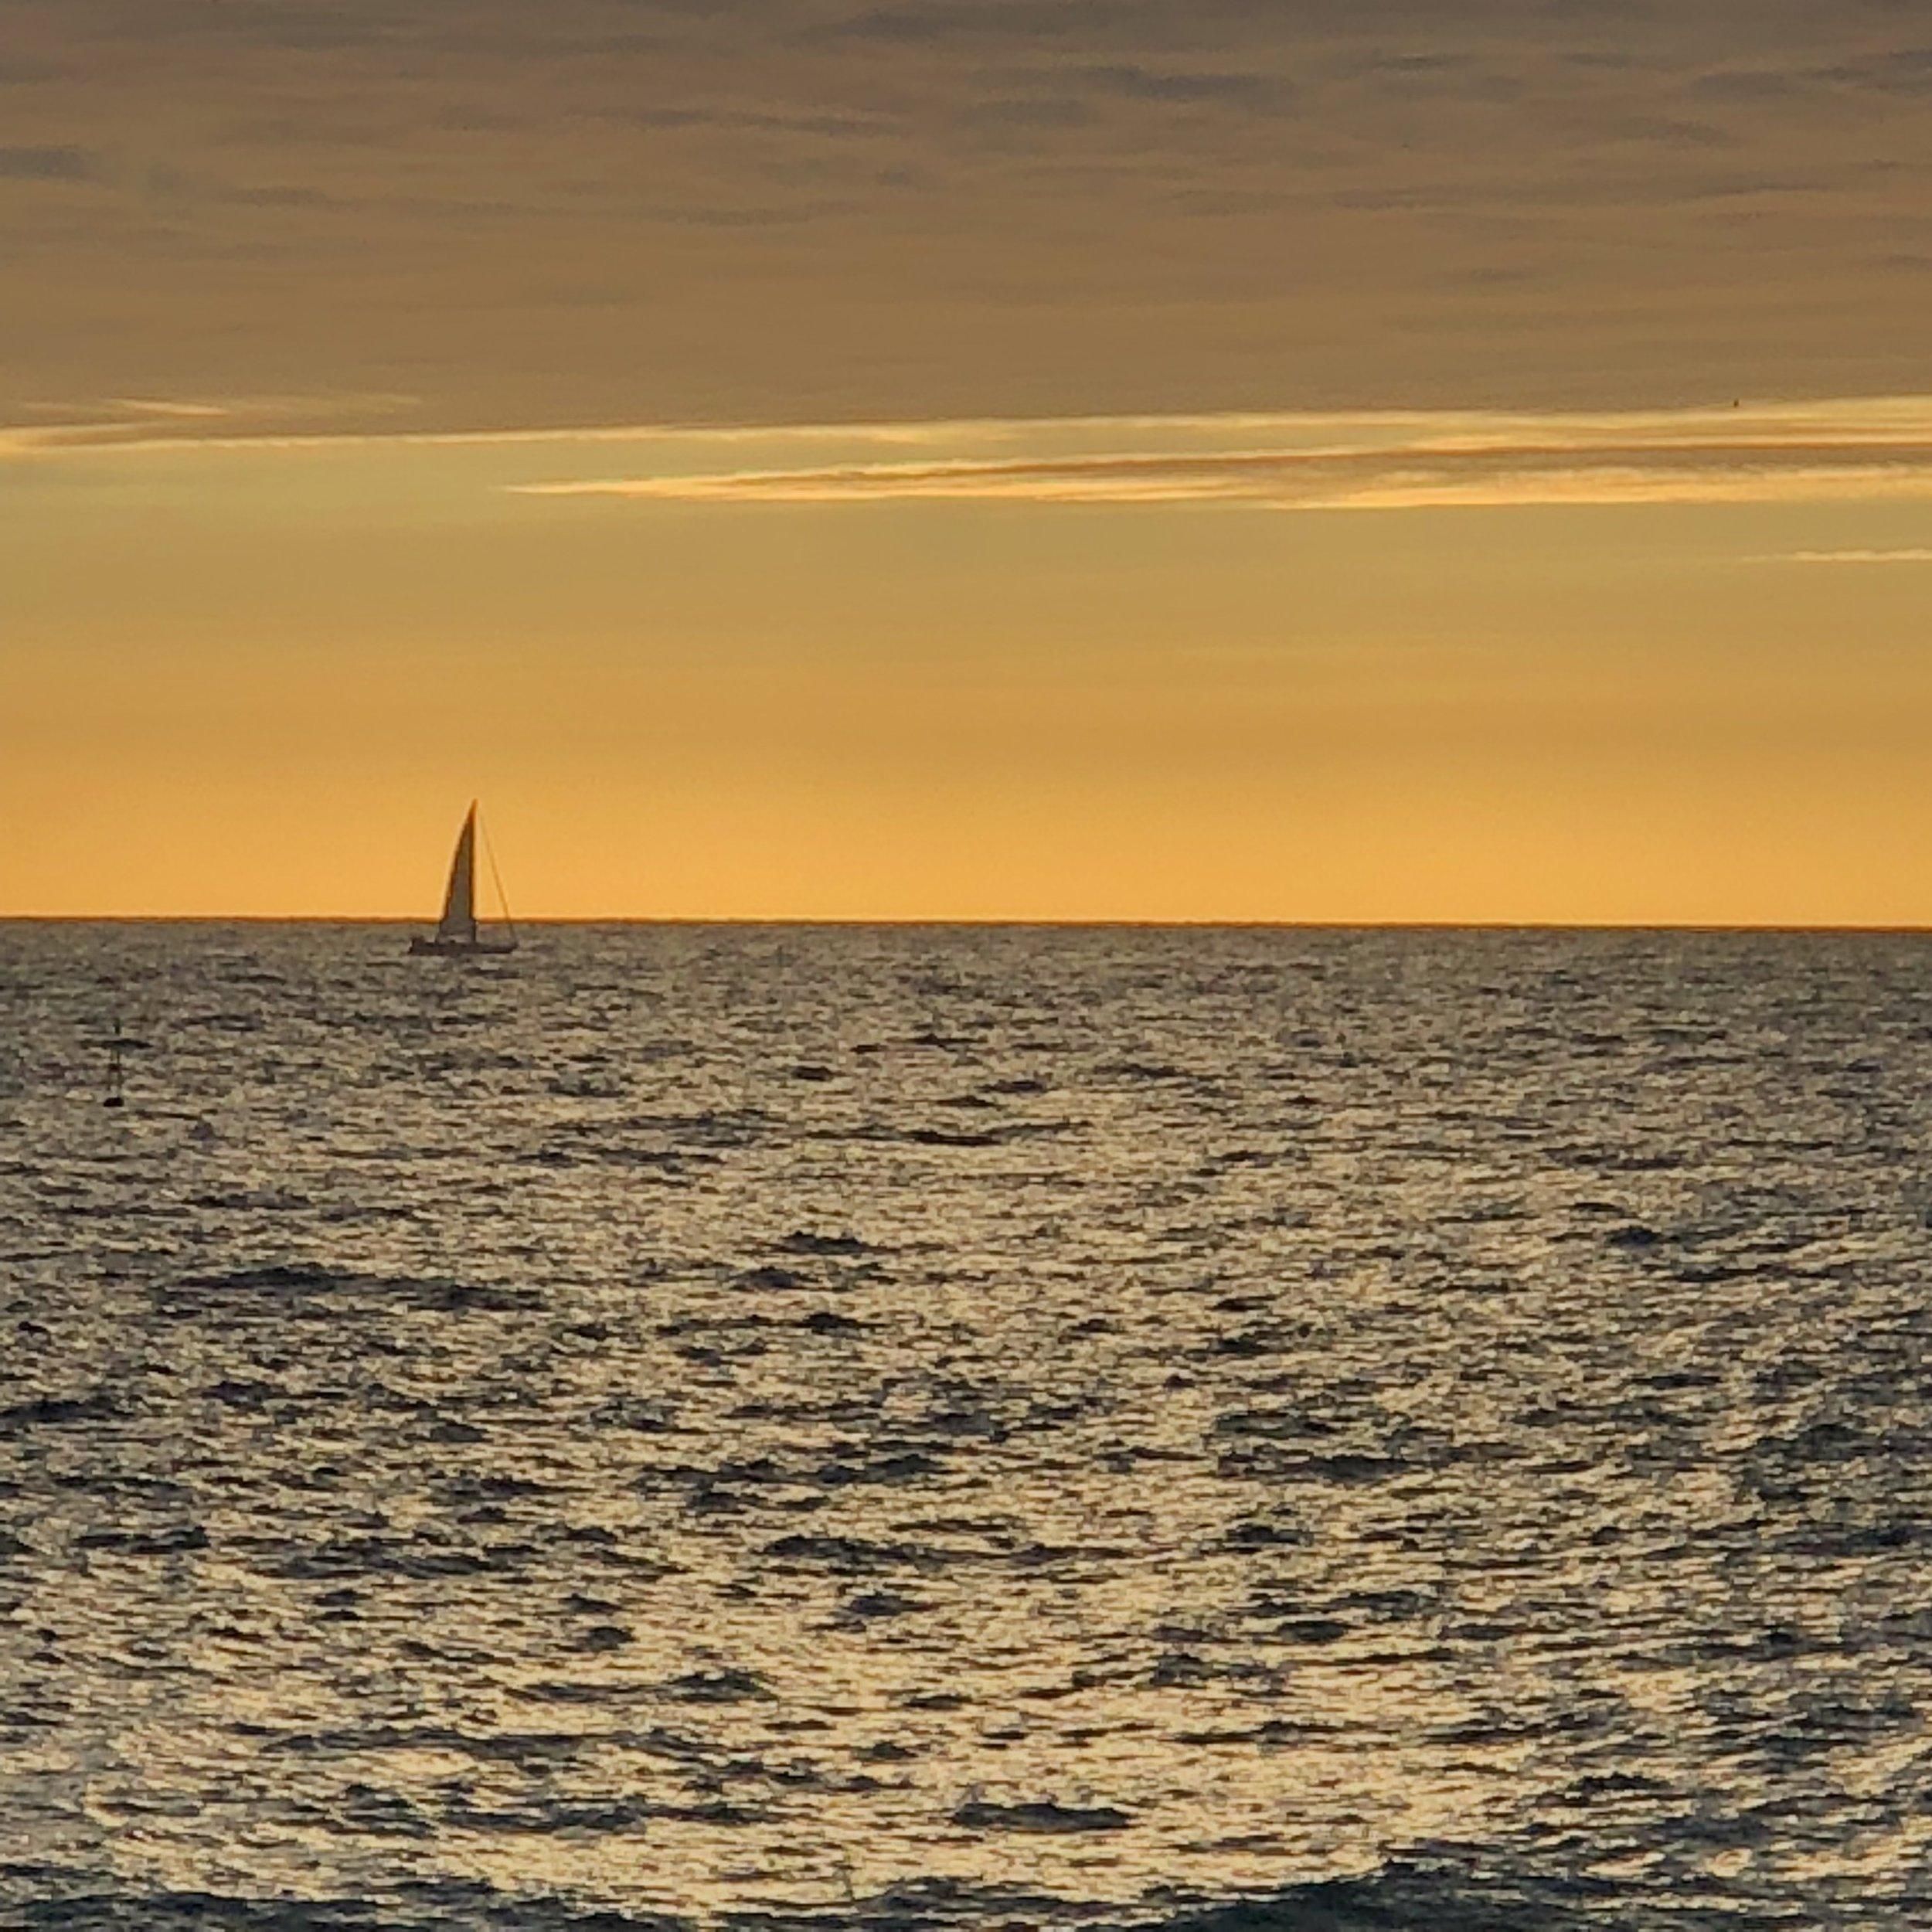 Sunrise over the Mediterranean Sea